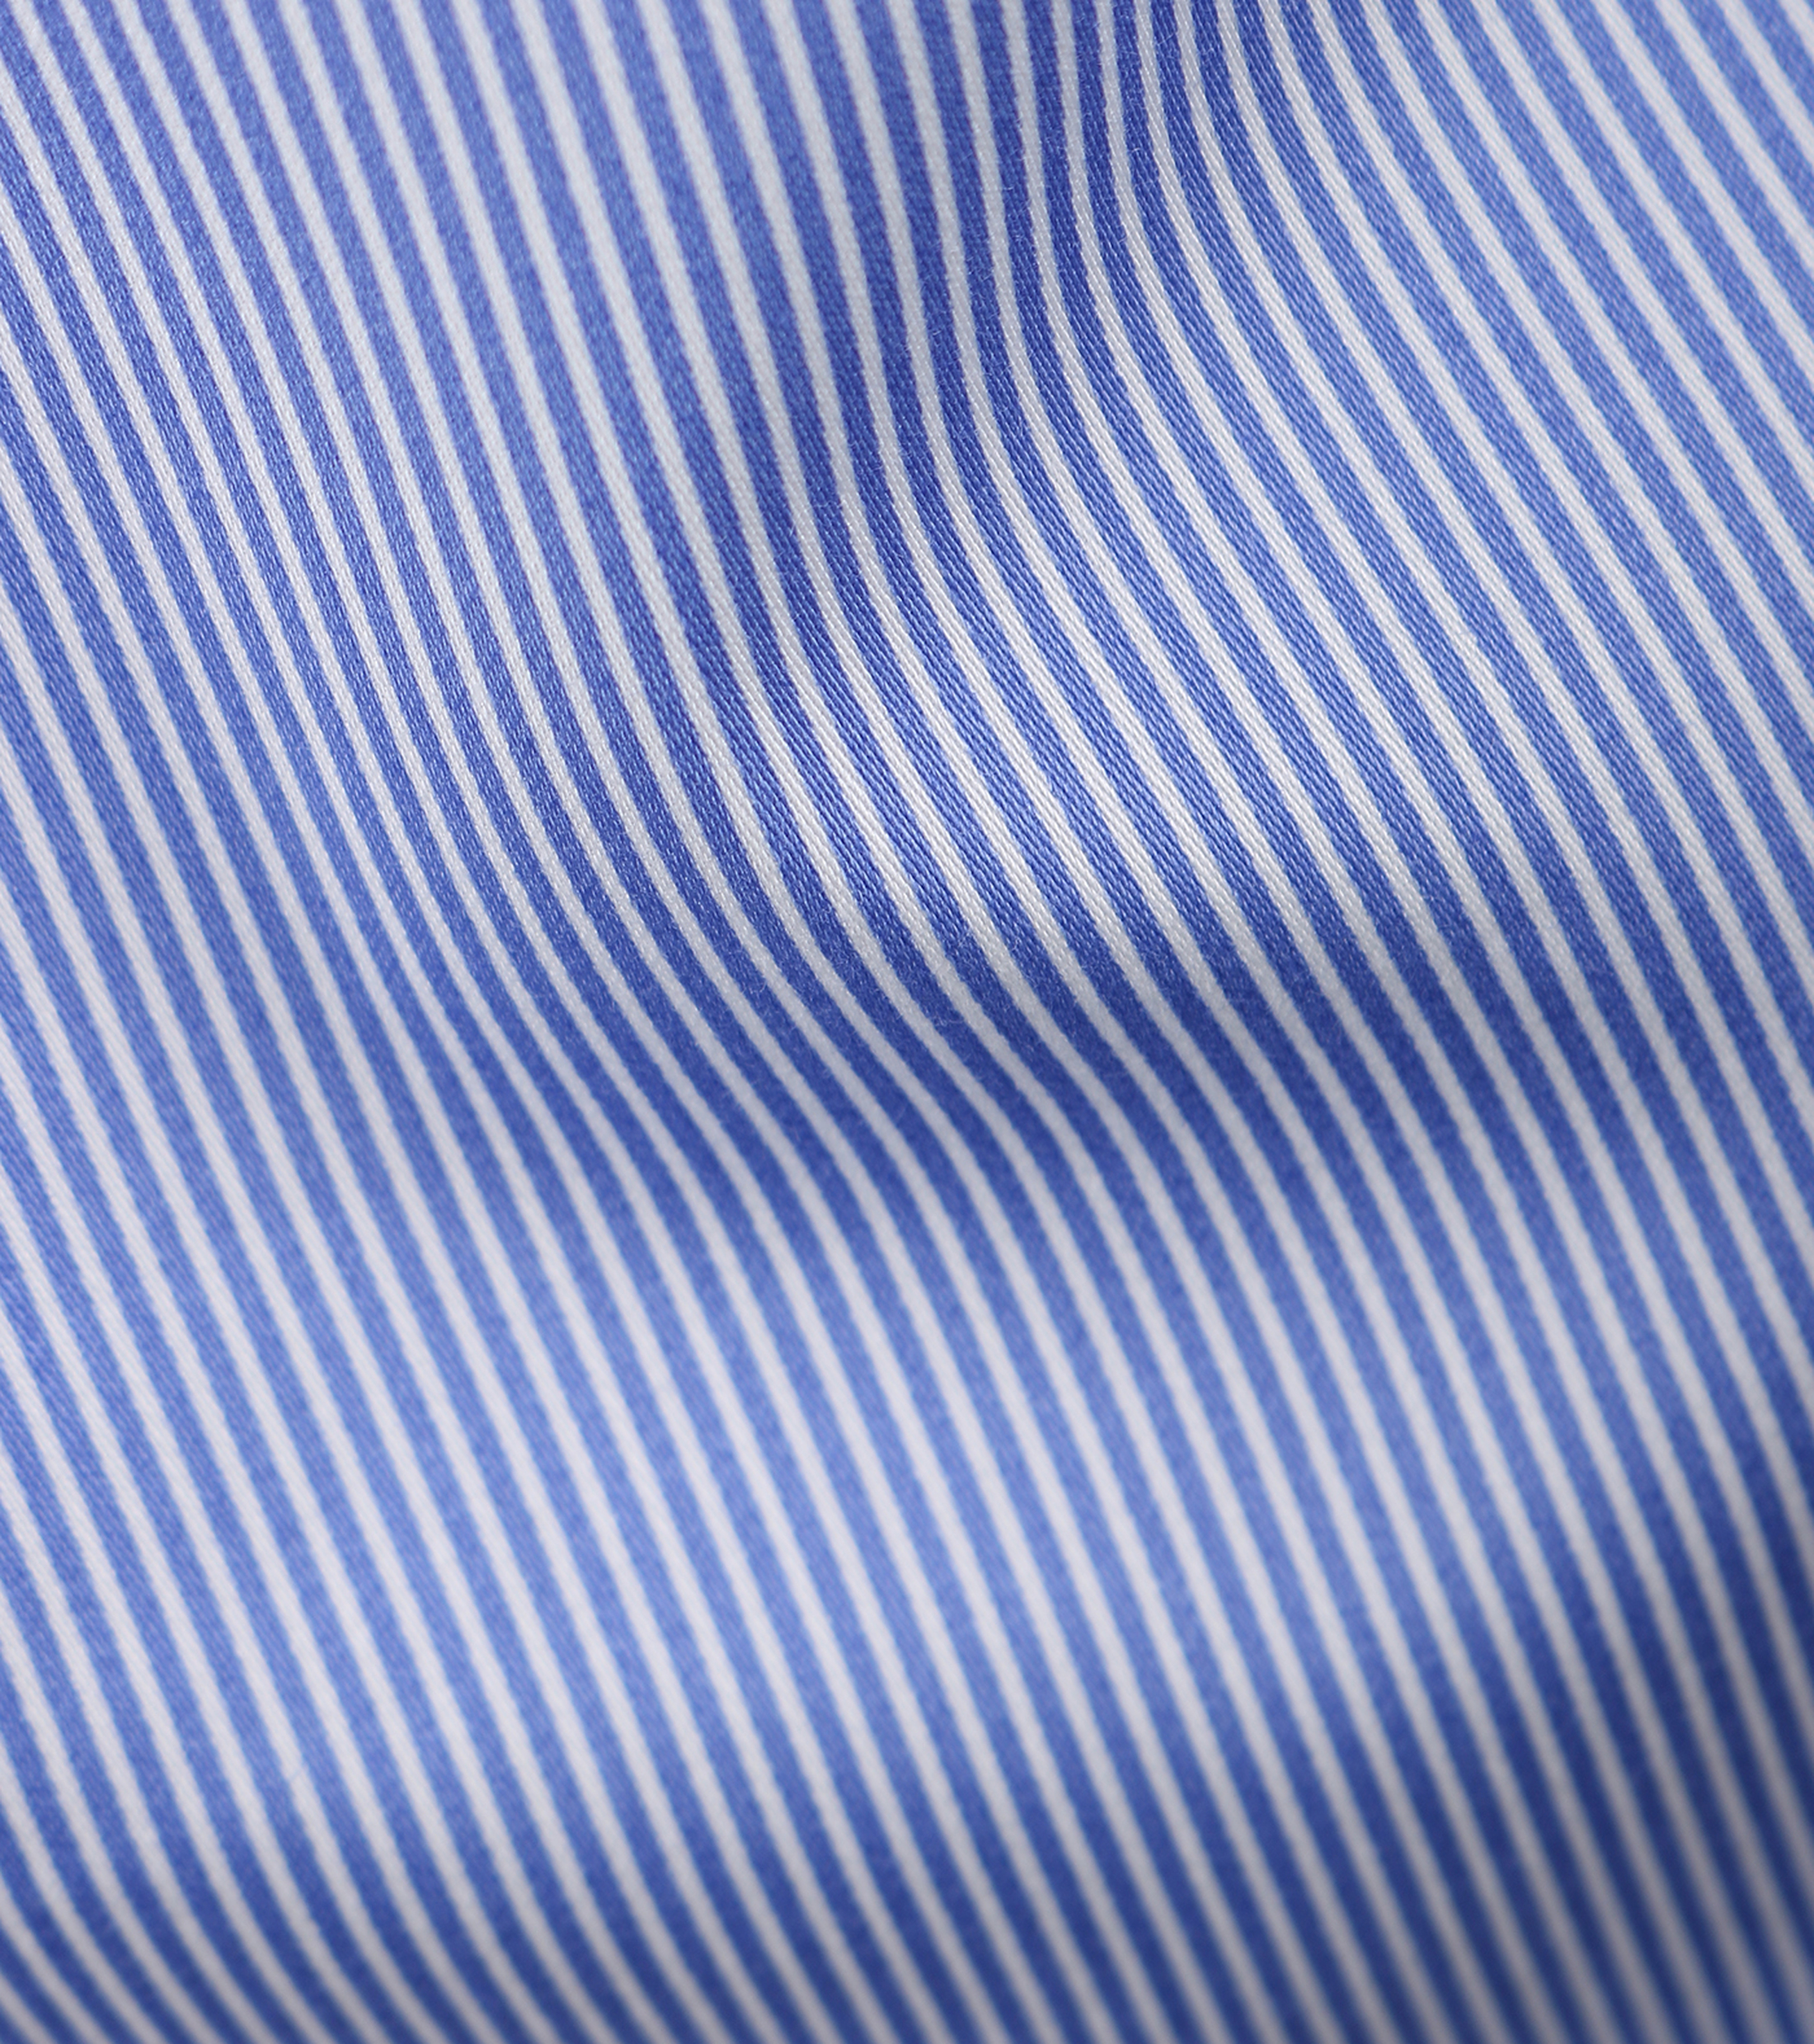 Casual Overhemd S3-6 Blauw Wit foto 2